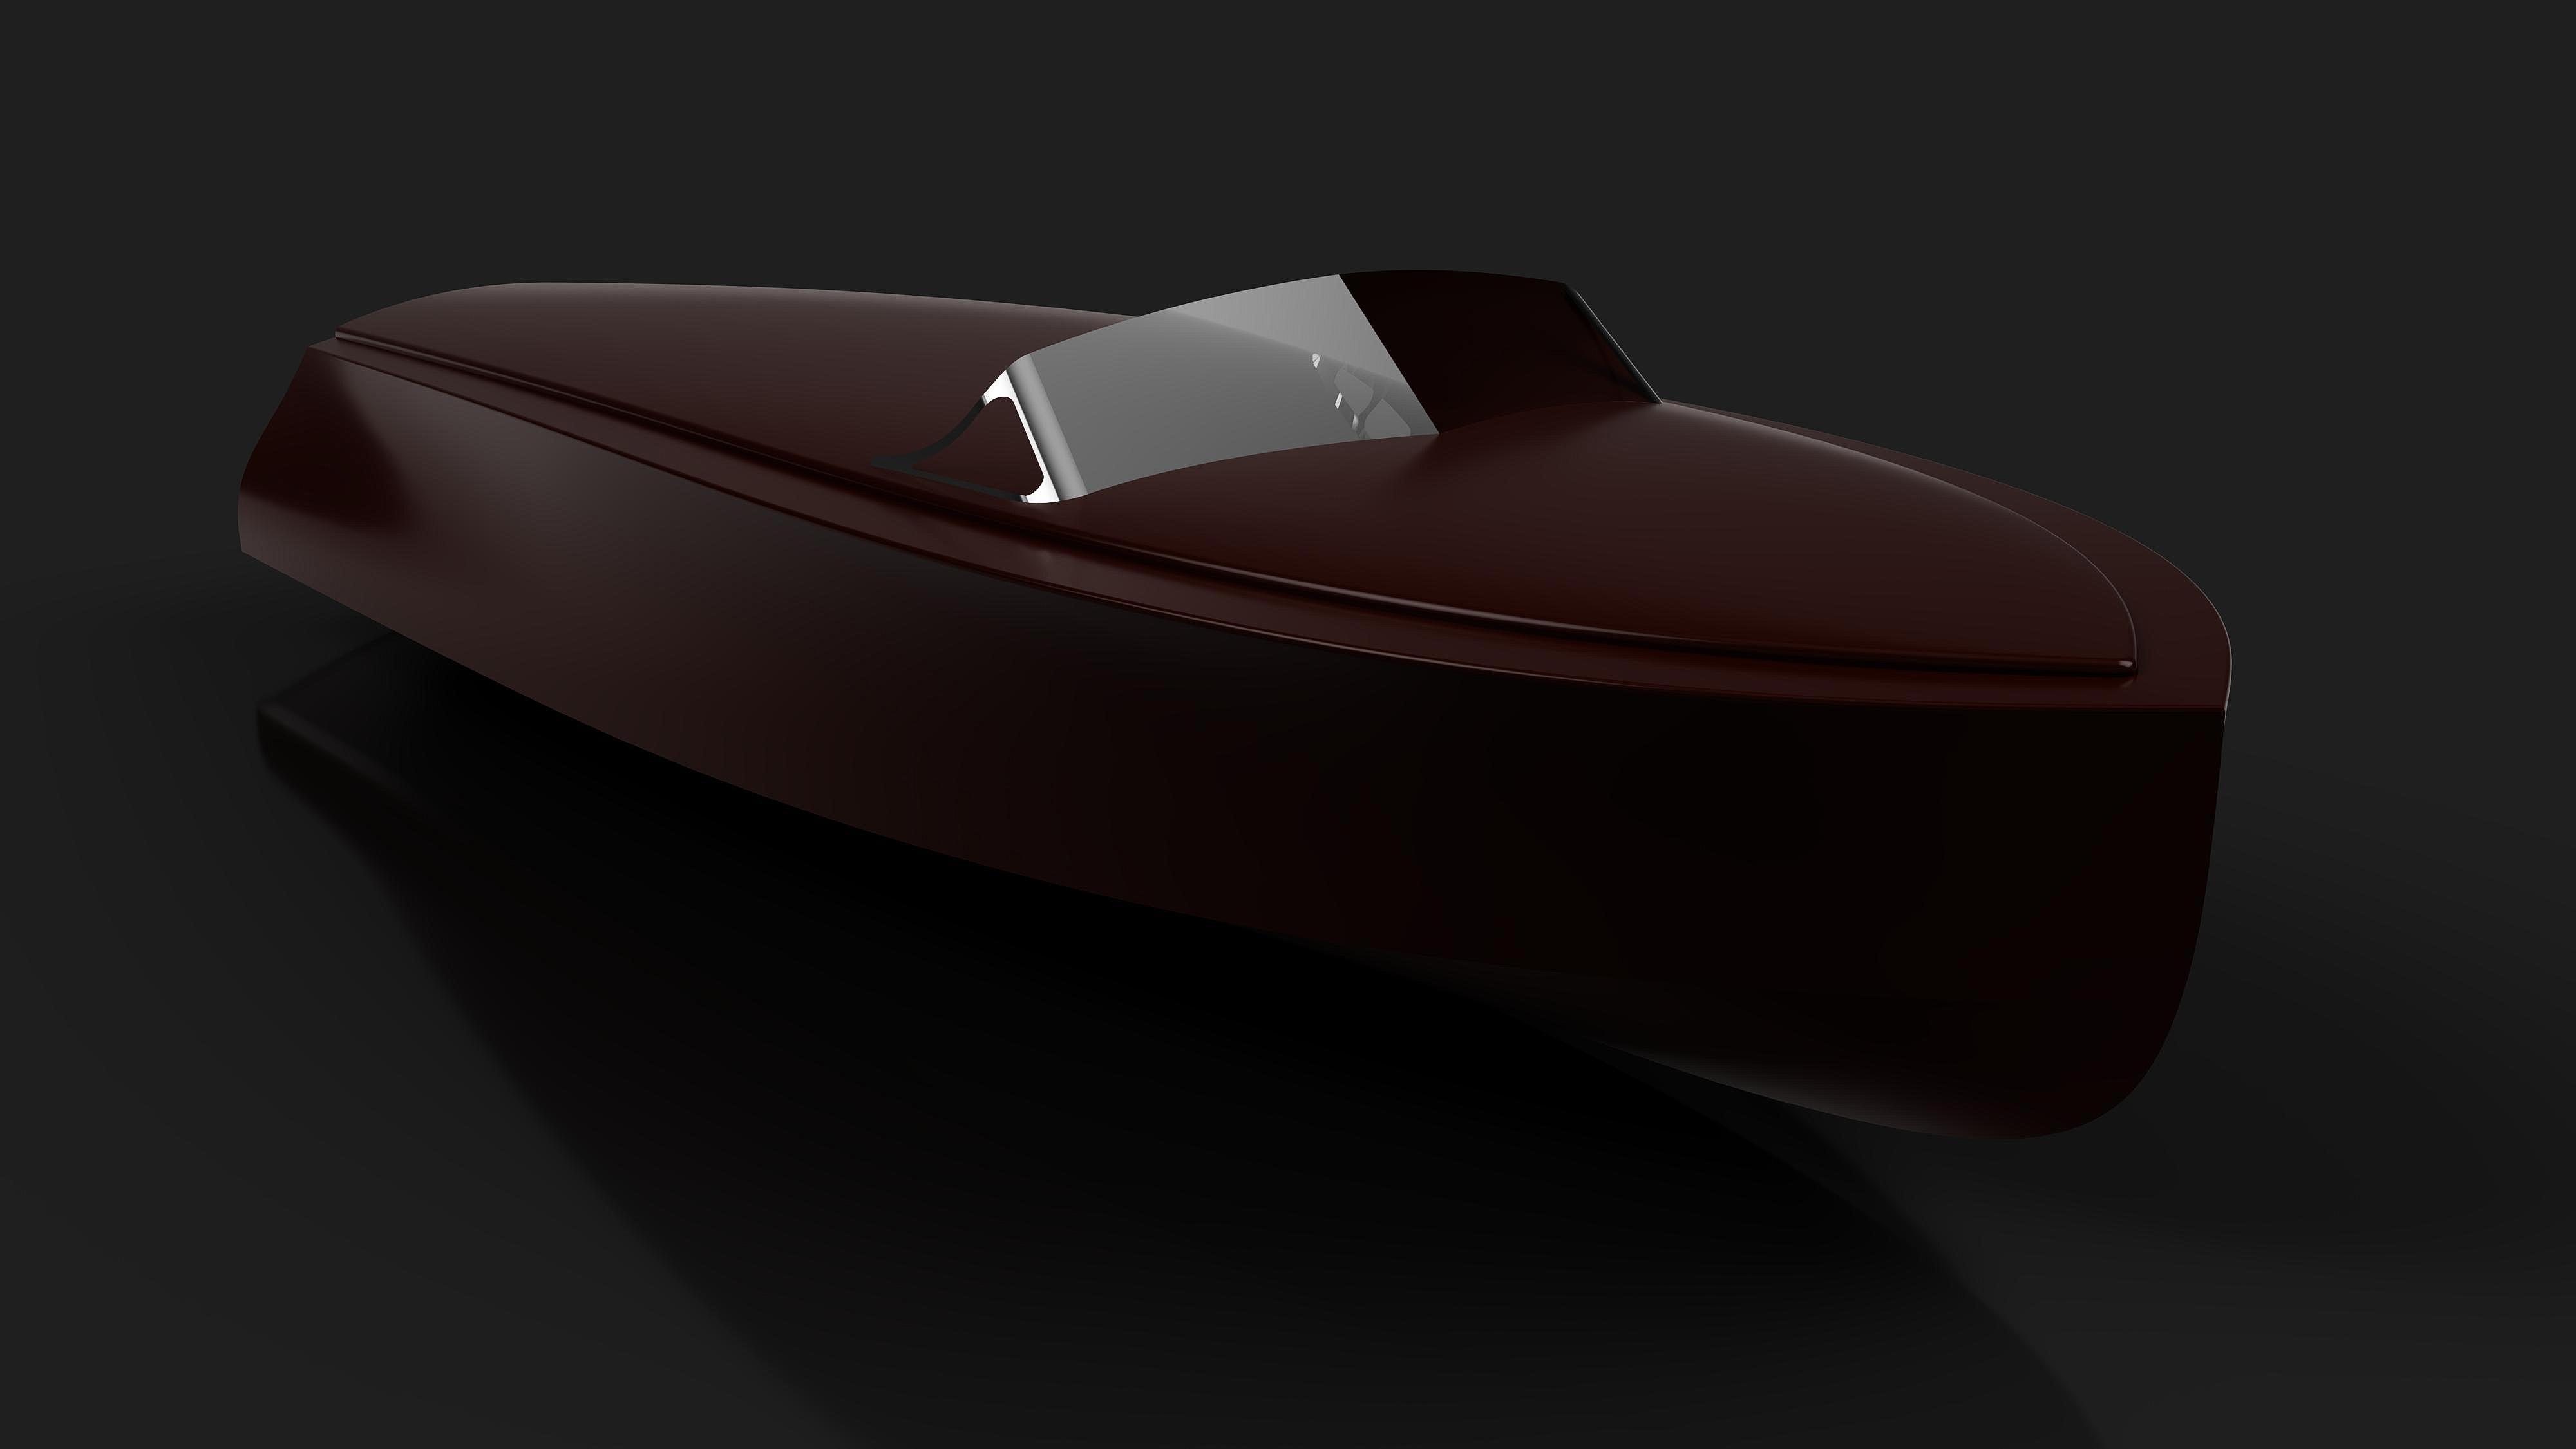 Modern wooden runabout yacht tender modern wooden runabout